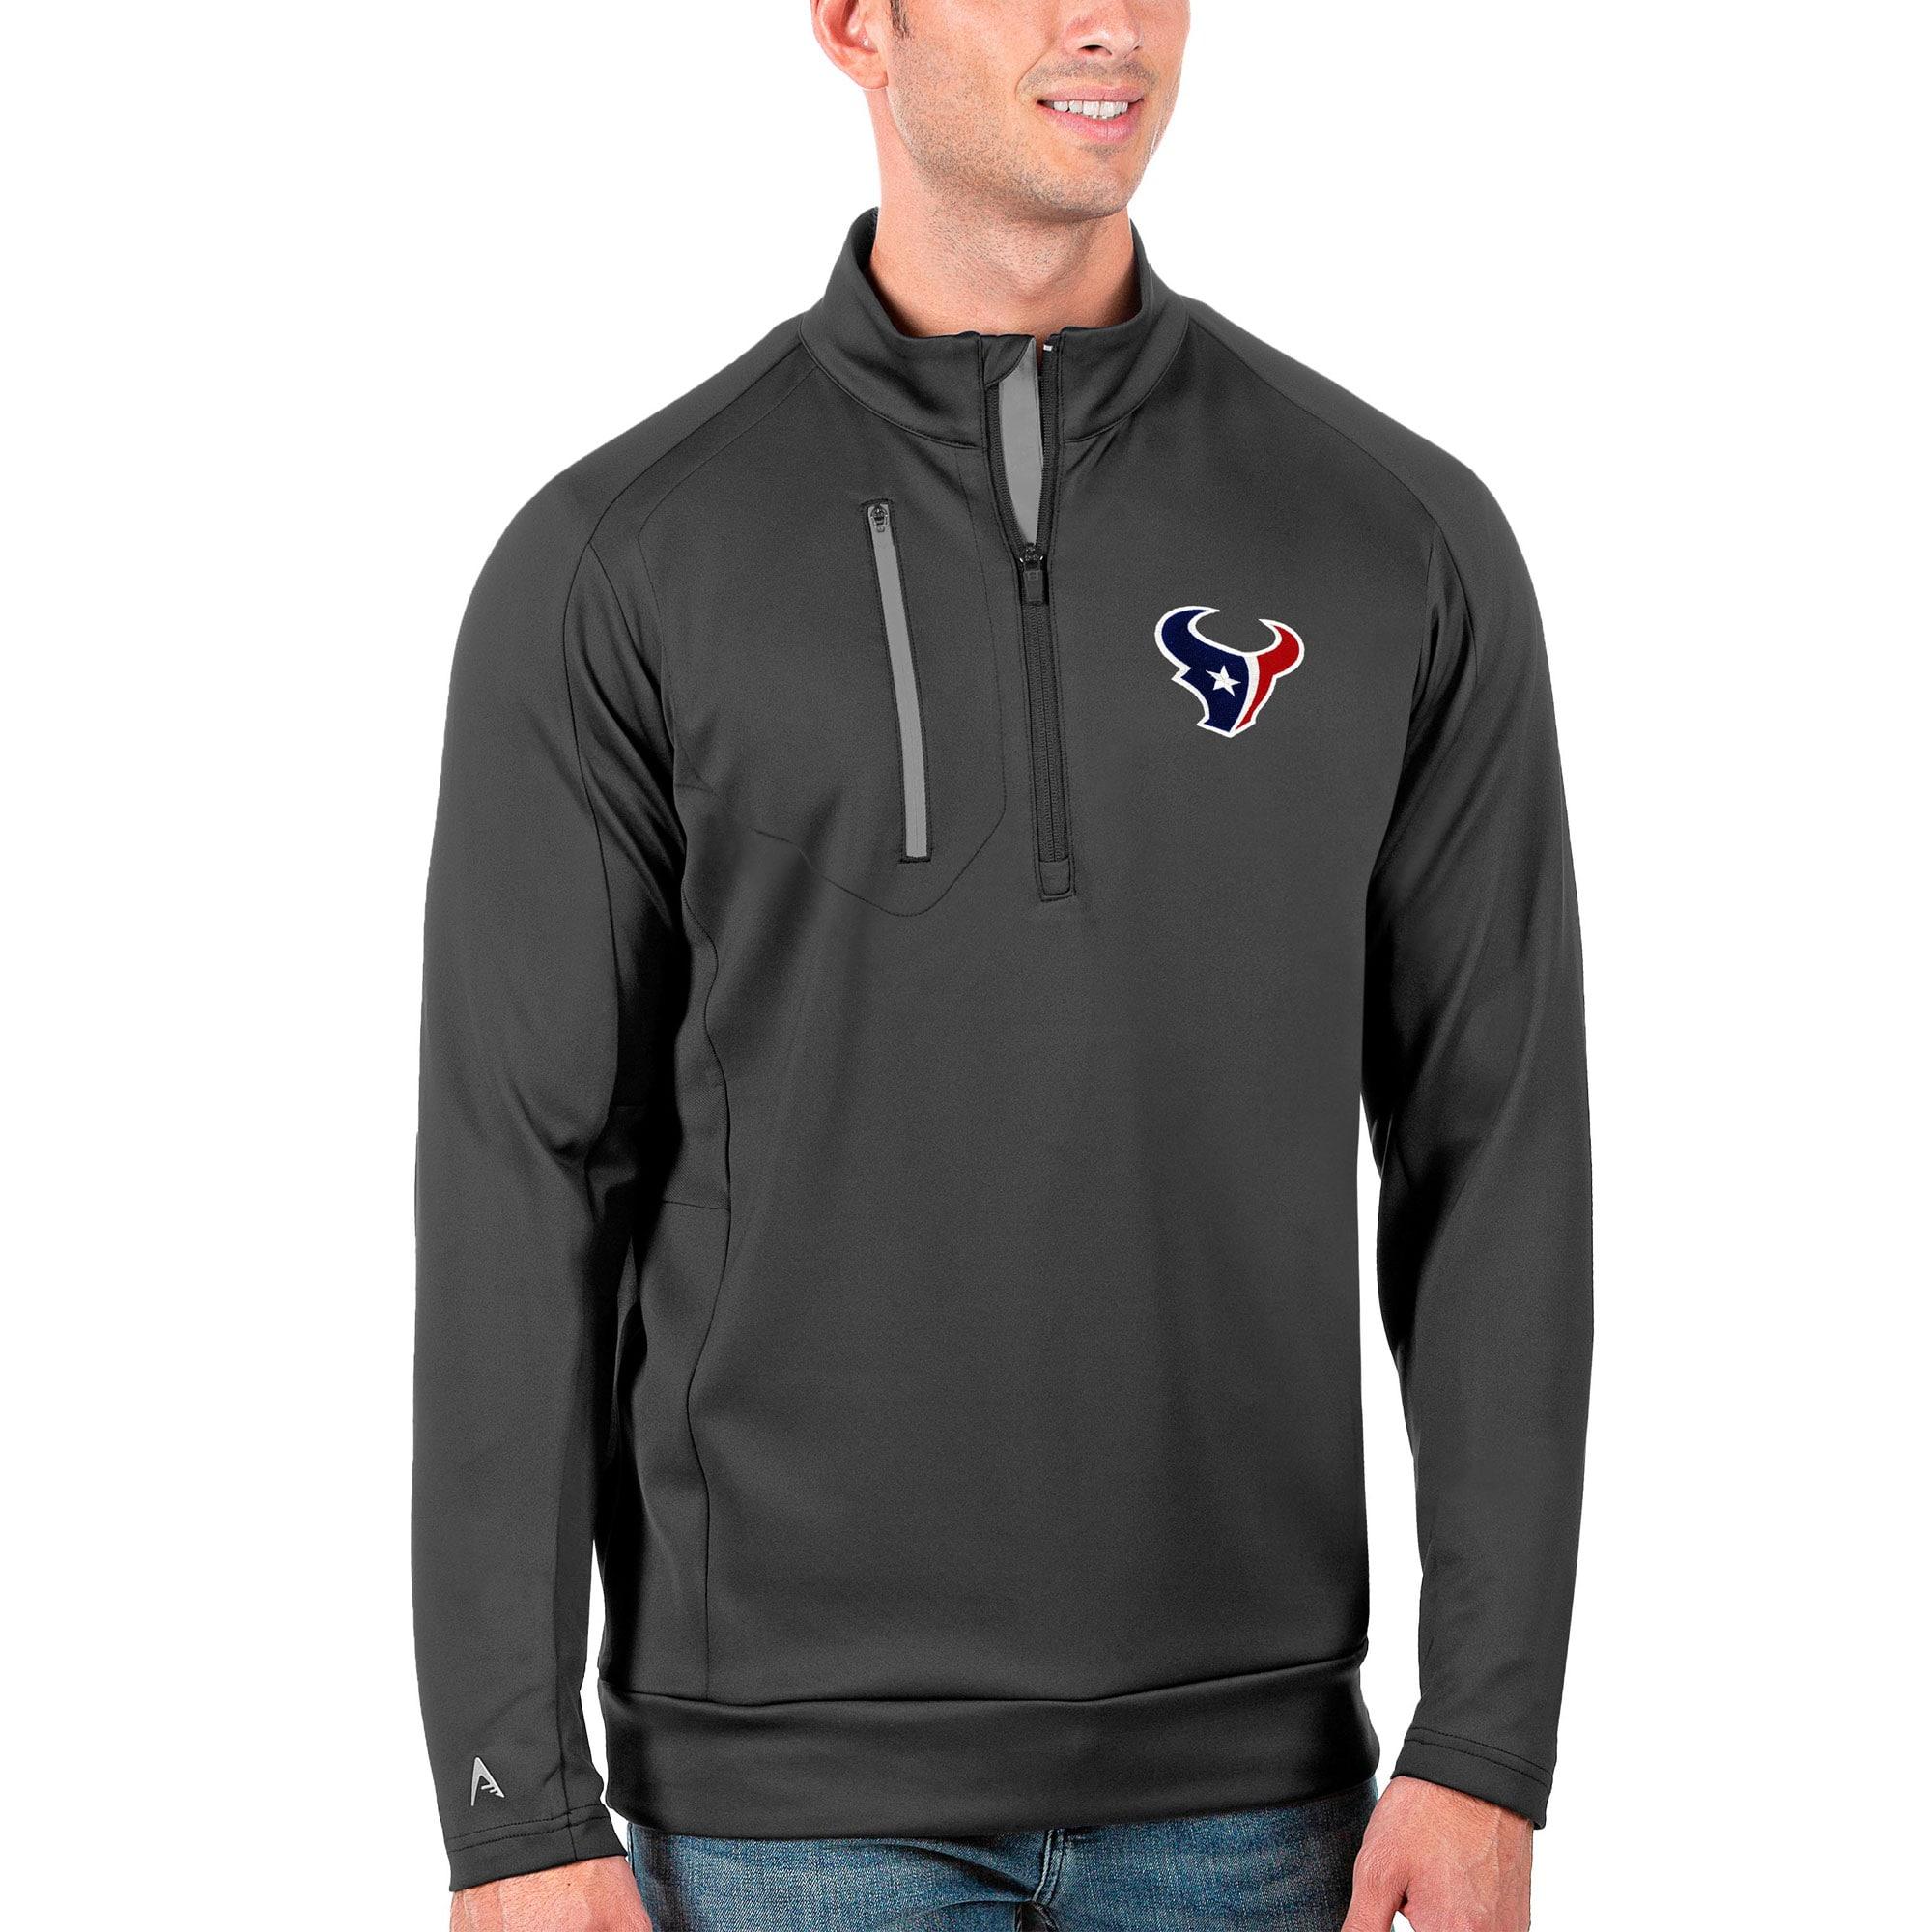 Houston Texans Antigua Generation Quarter-Zip Pullover Jacket - Charcoal/Silver